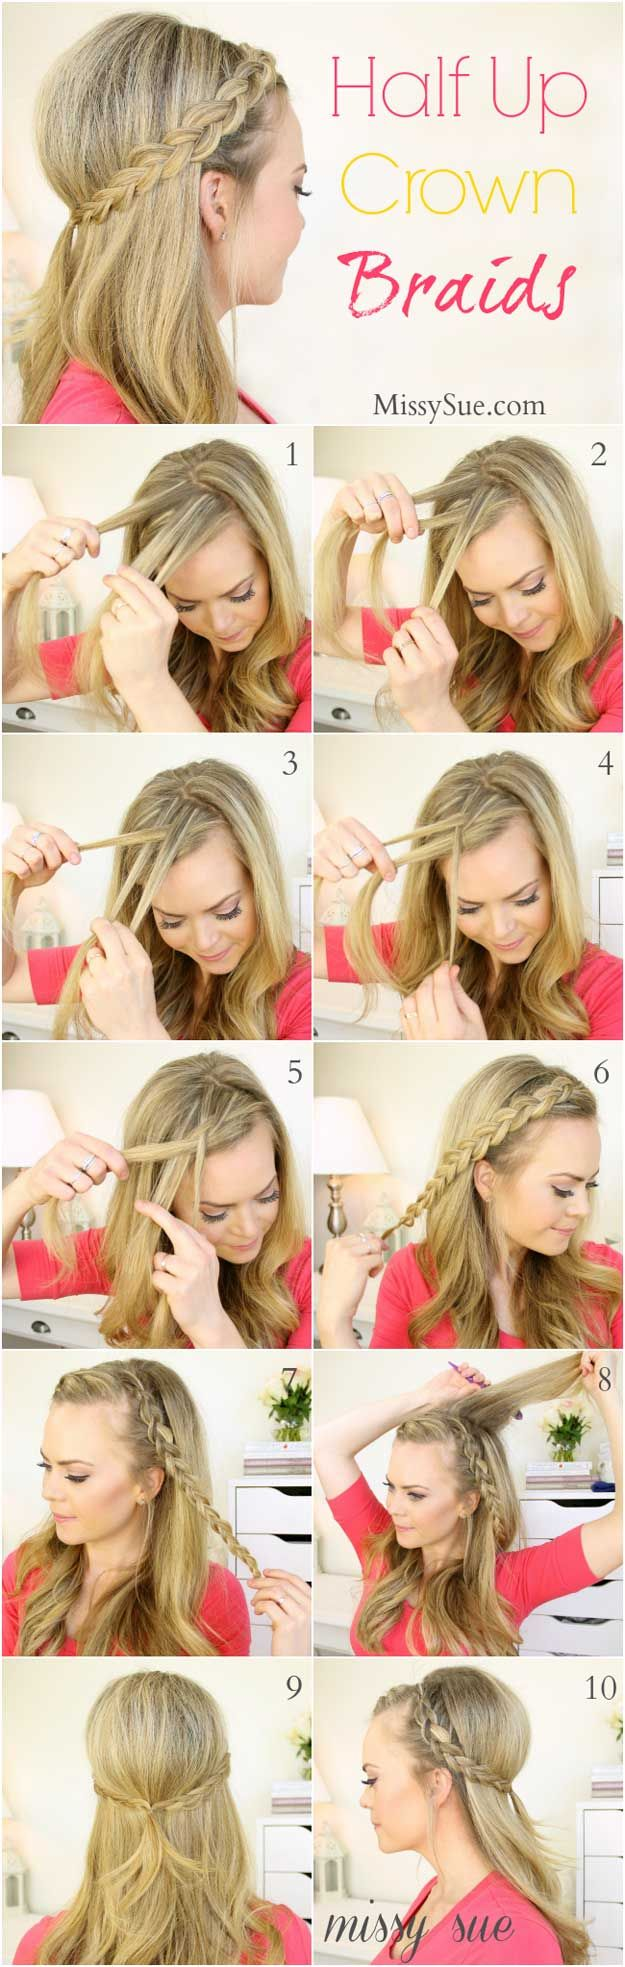 amazing - hairstyles